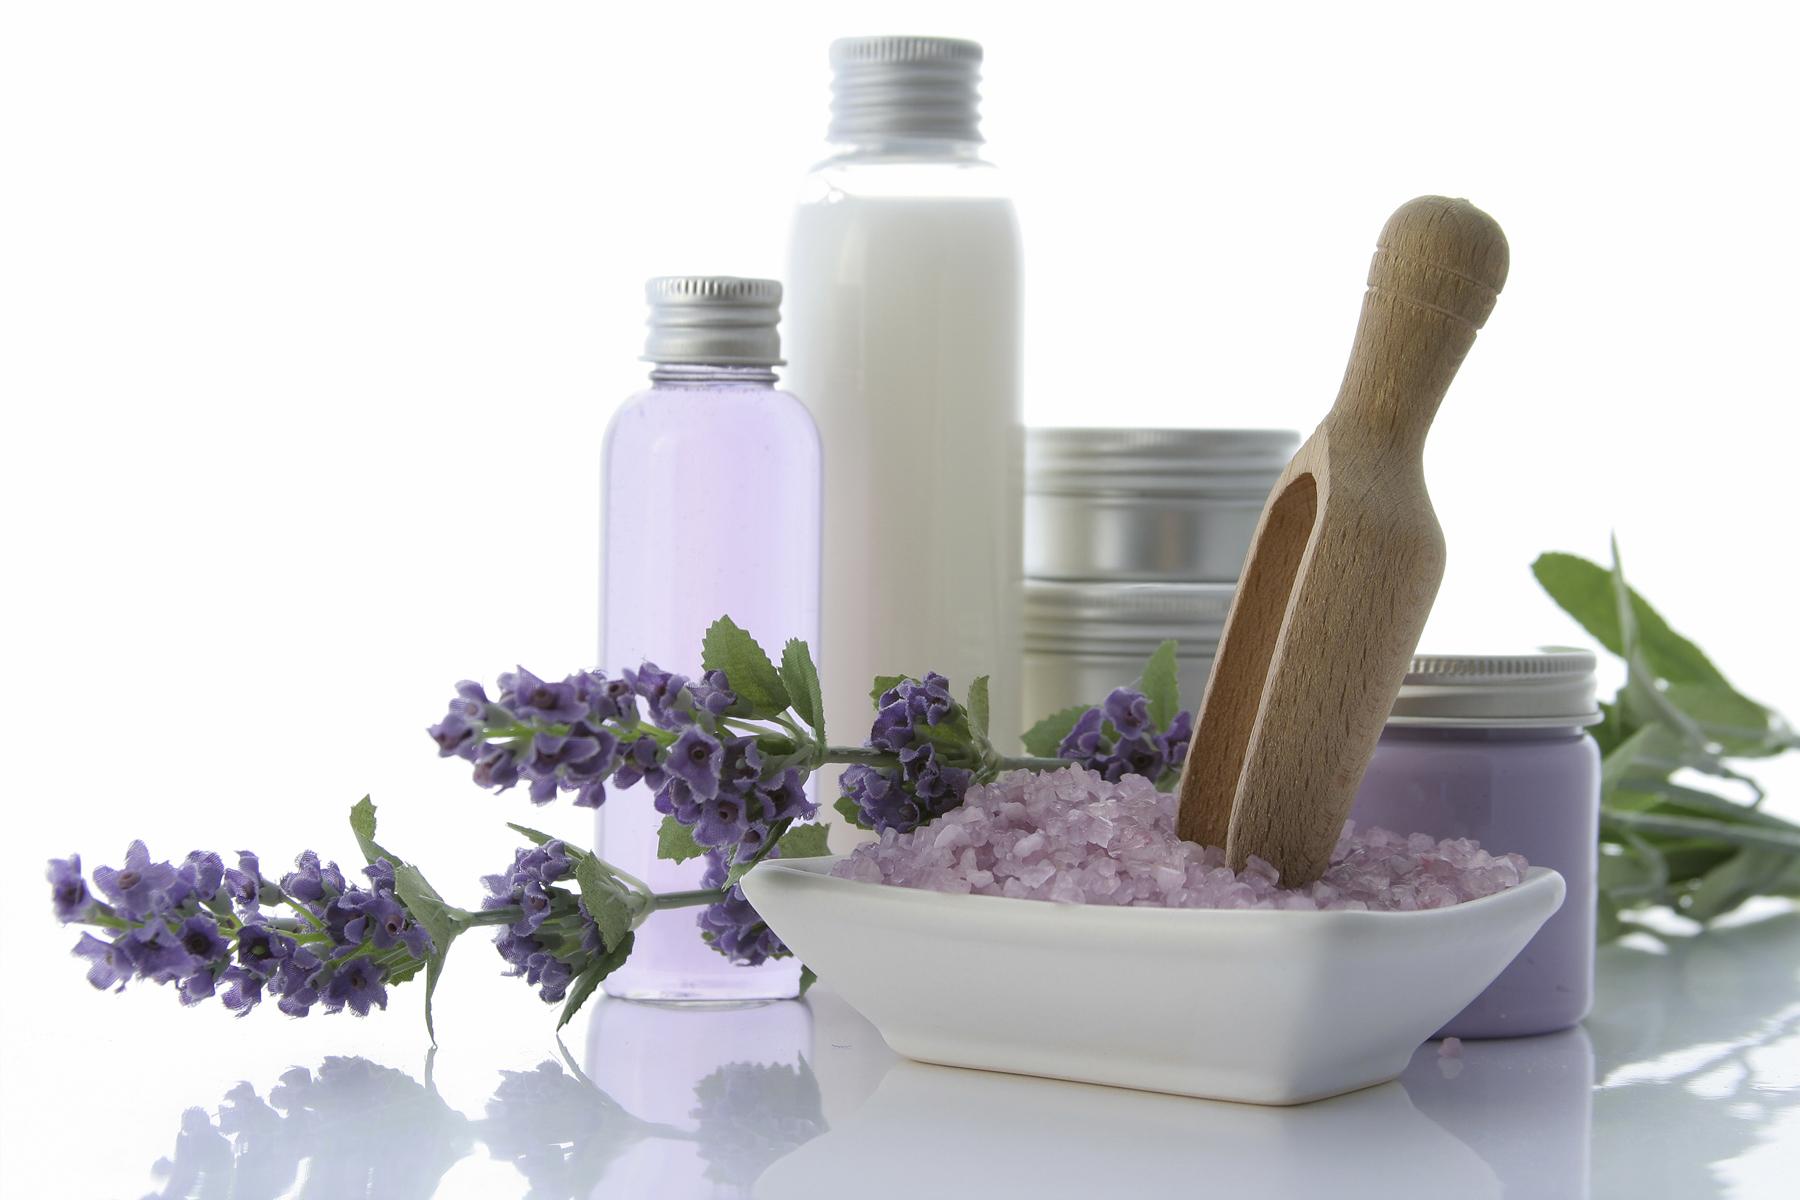 AromaTherapy-lavendar